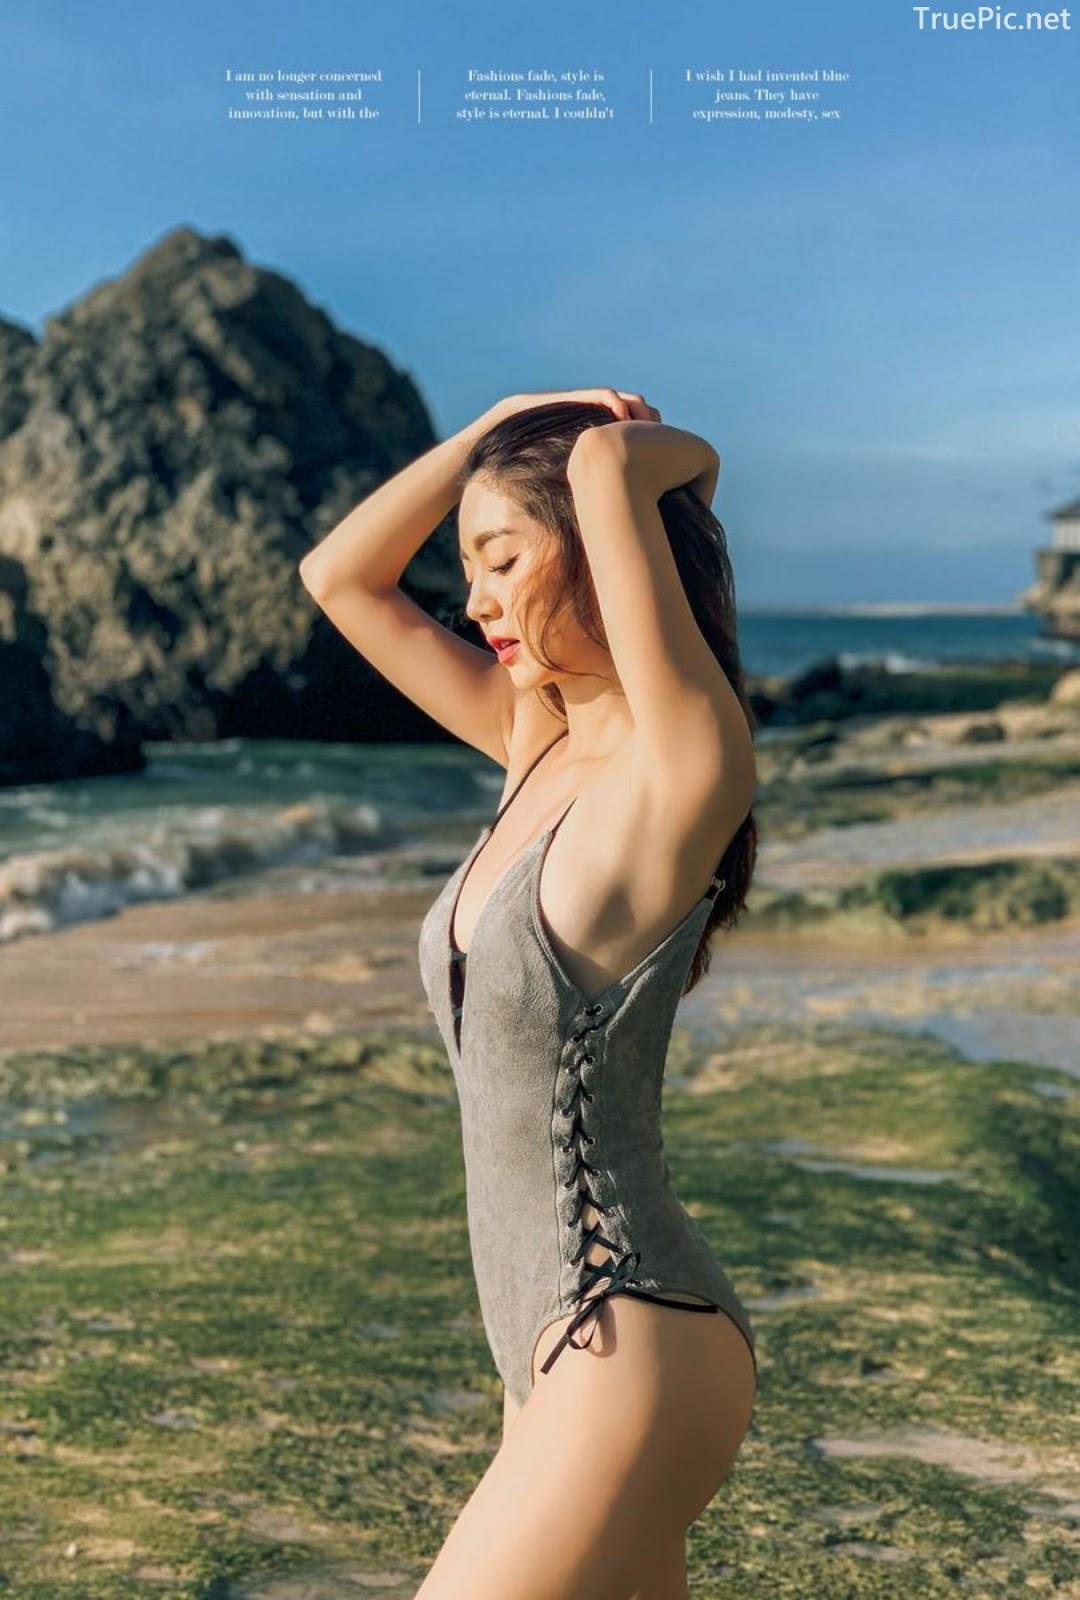 Korean fashion model Lee Chae Eun - Push Monokini - Picture 9